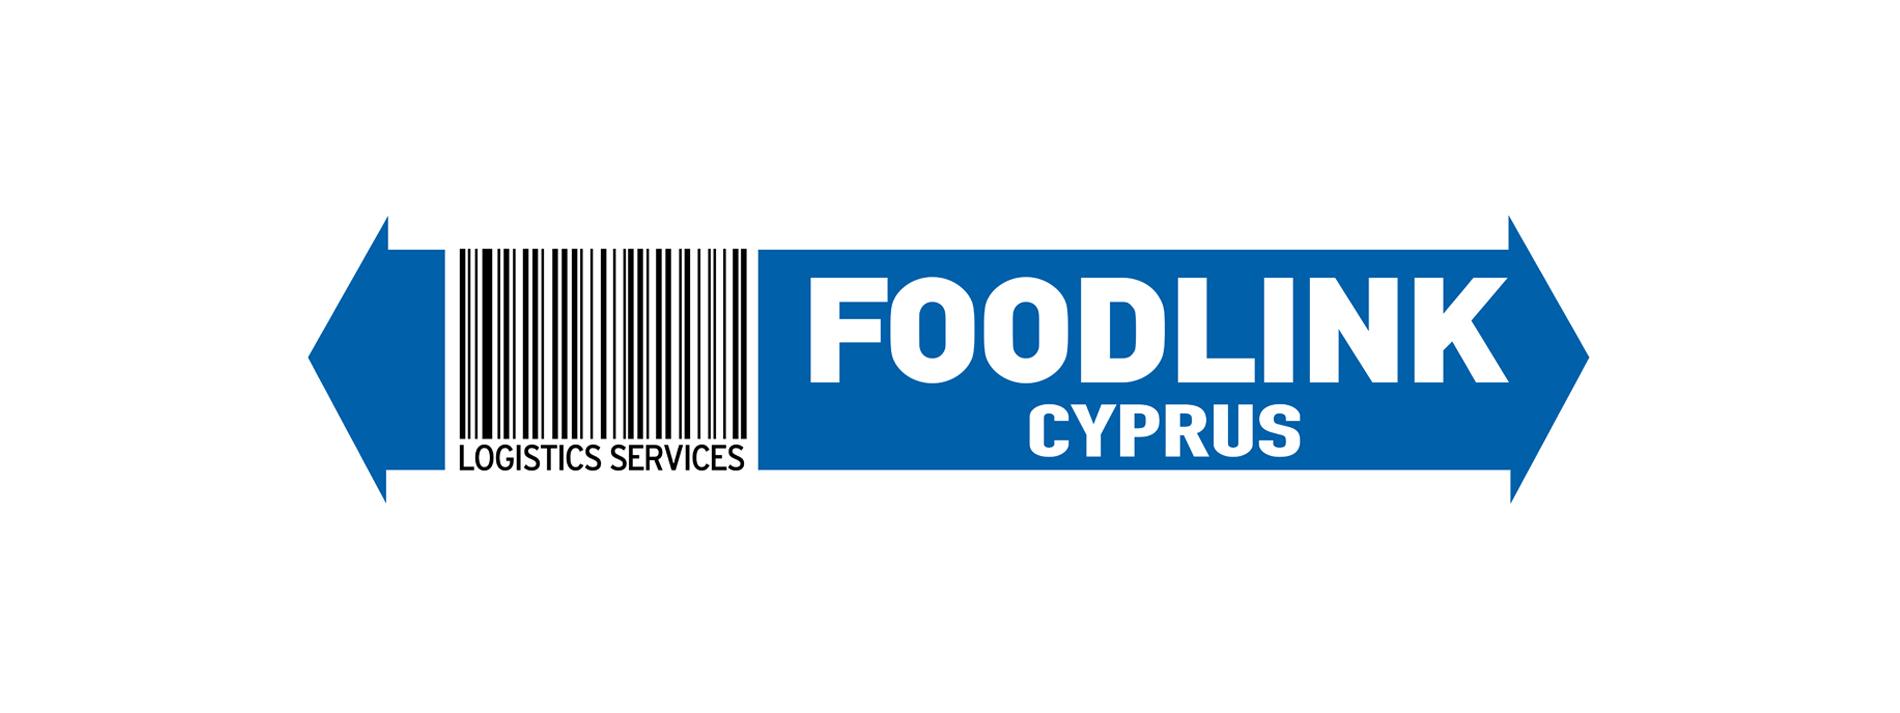 Foodlink_cyprus_logo